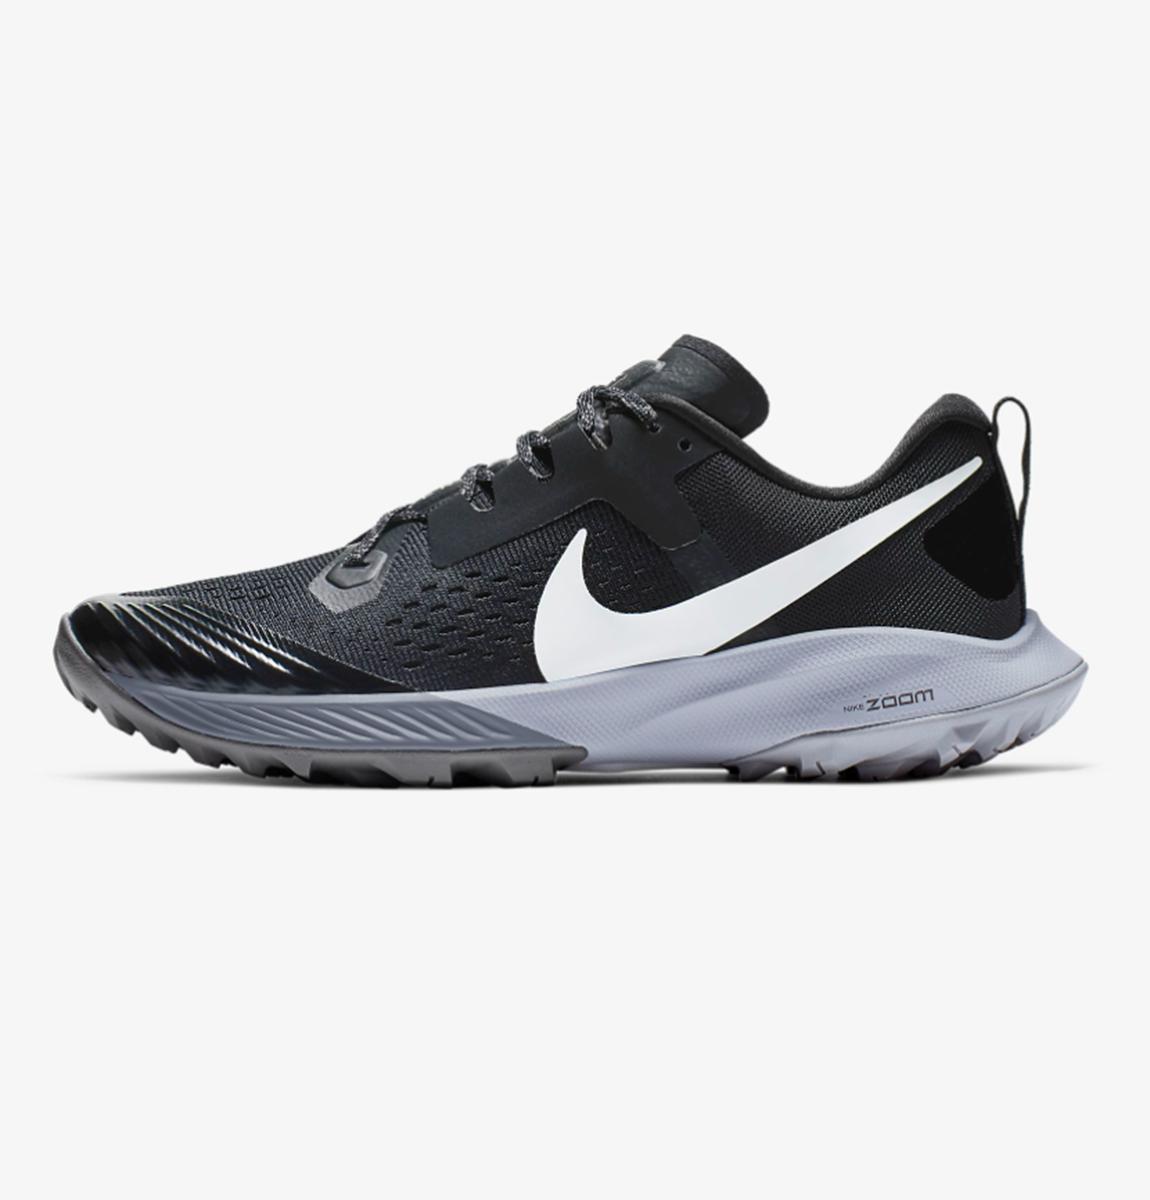 Bilde av Nike  W NIKE AIR ZOOM TERRA KIGER 5 AQ2220-001